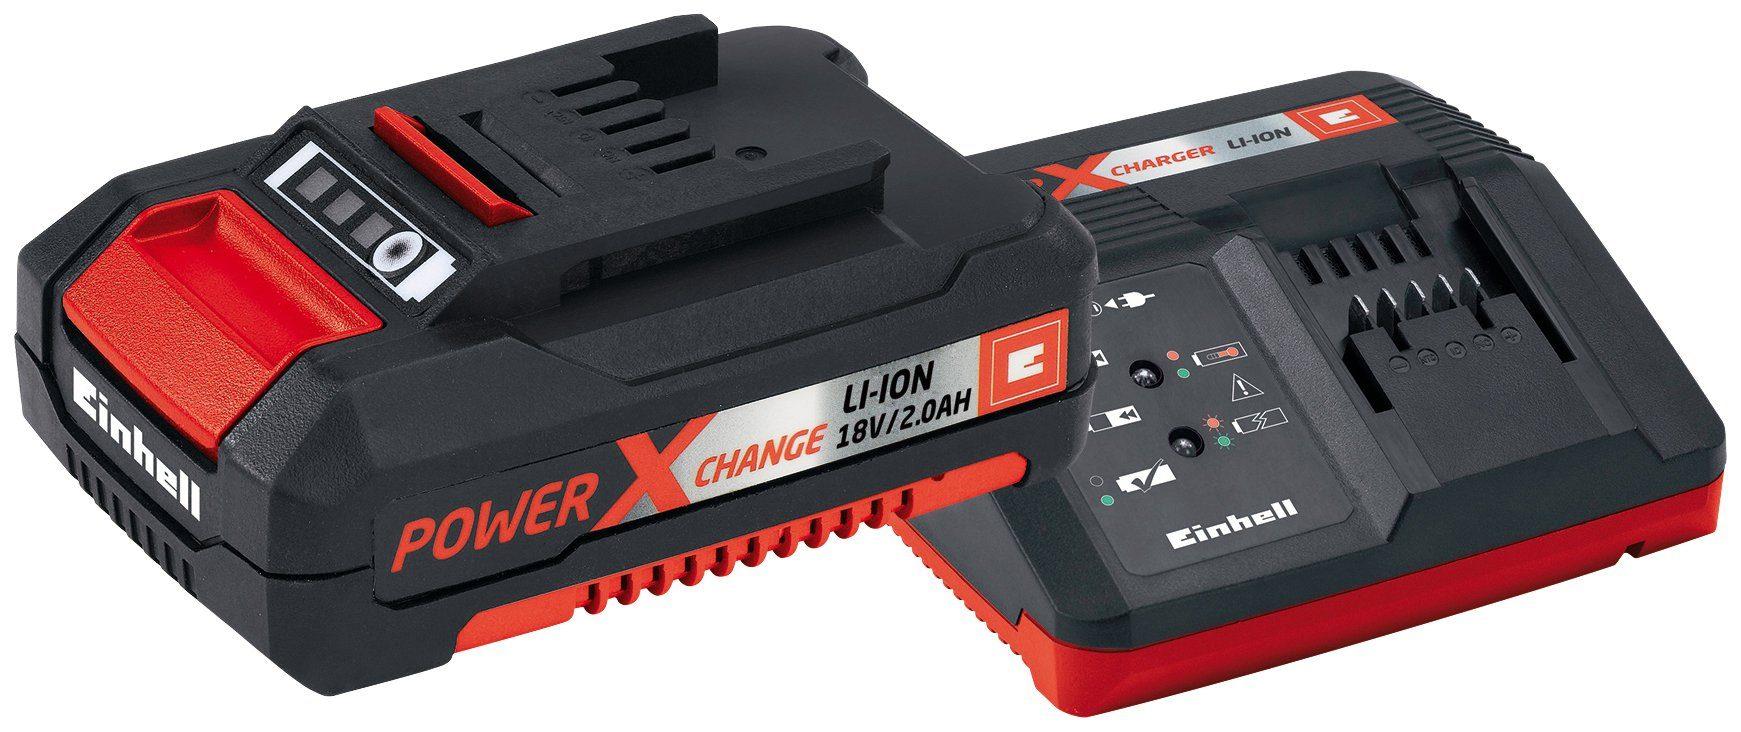 EINHELL Akku-Set »Starter-Kit Power X-Change «, 18 V, 2 Ah und Ladegerät